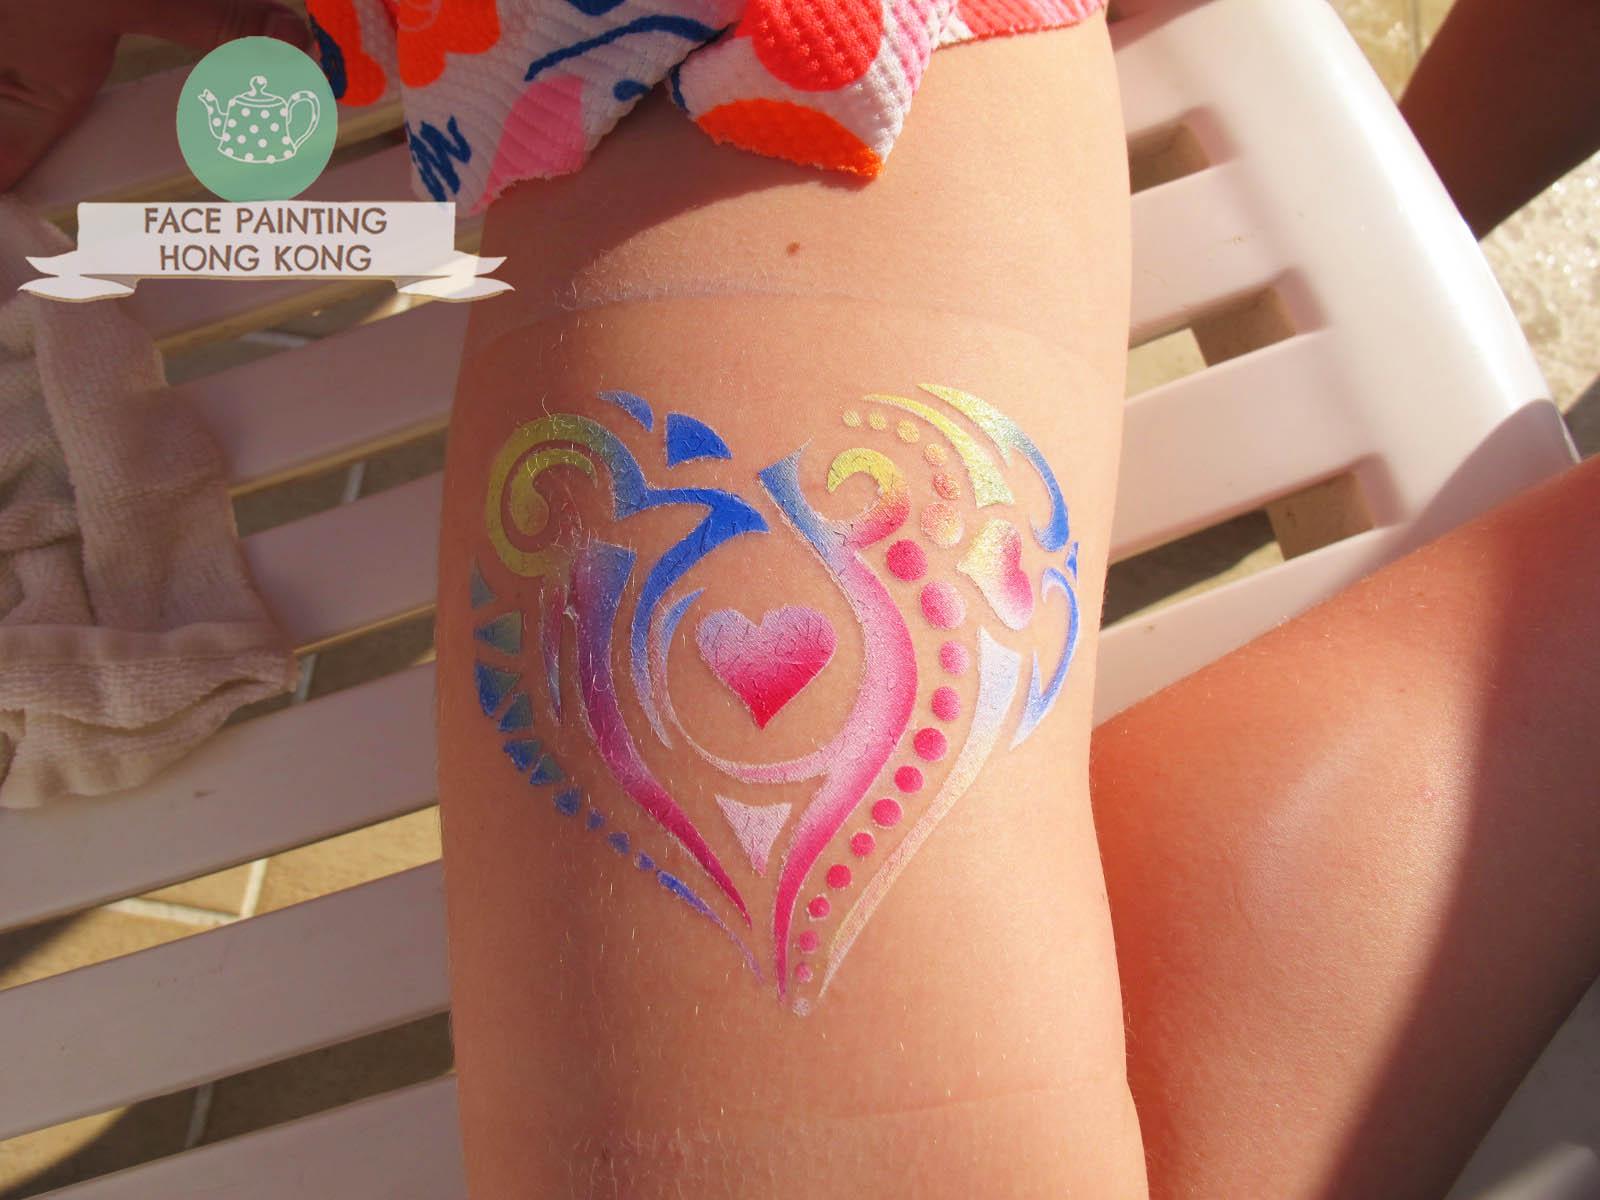 Waterproof spray tattoo